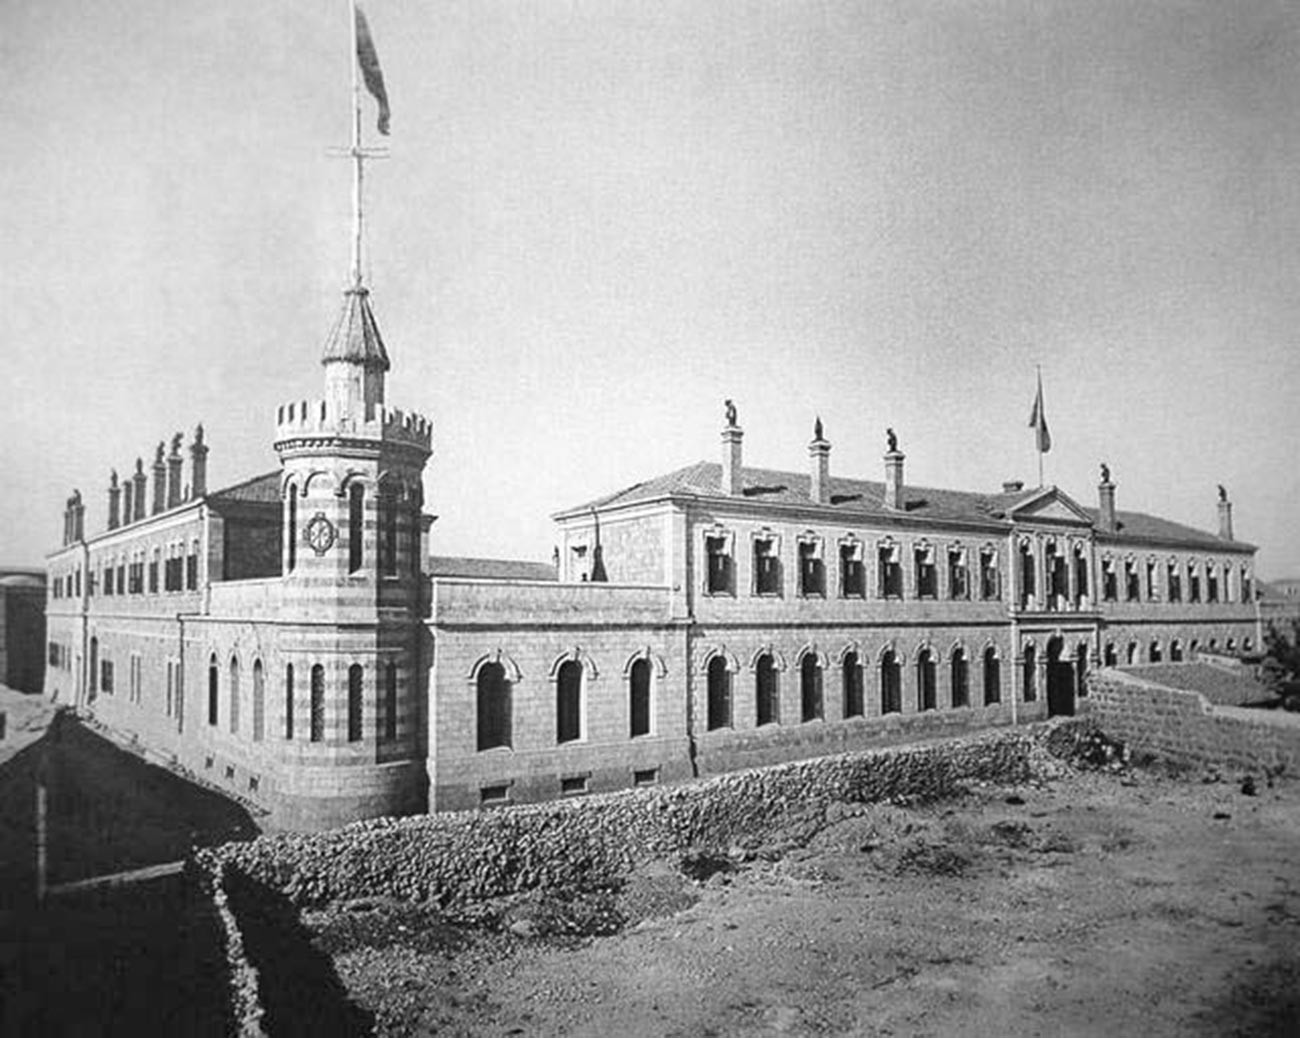 Sergei Courtyard Masyarakat Imperial Ortodoks Palestina di Yerusalem, 1889.